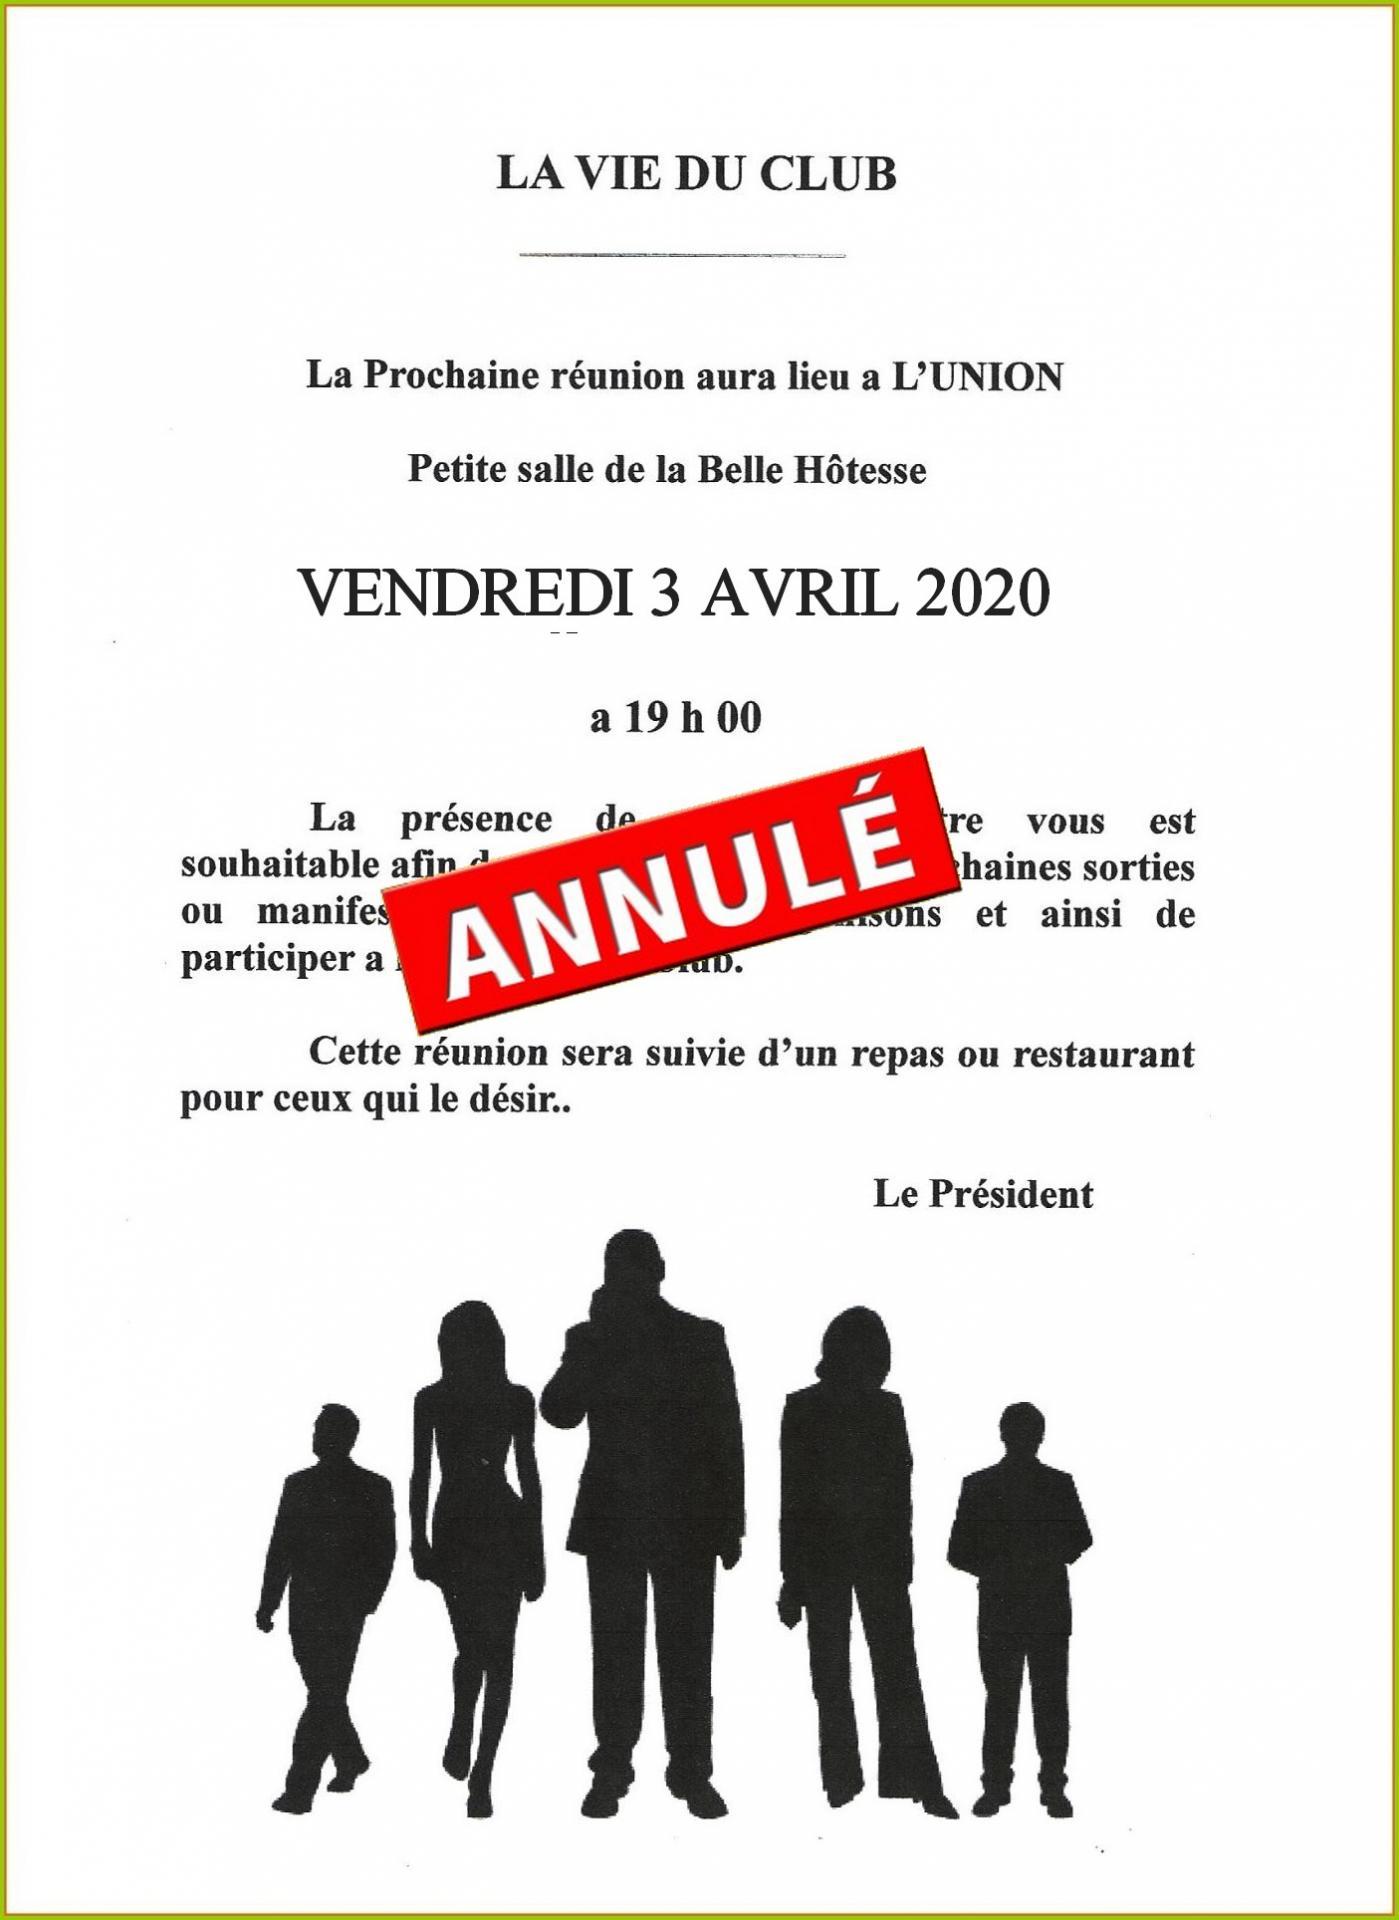 Reunion belle hotesse 04 2020